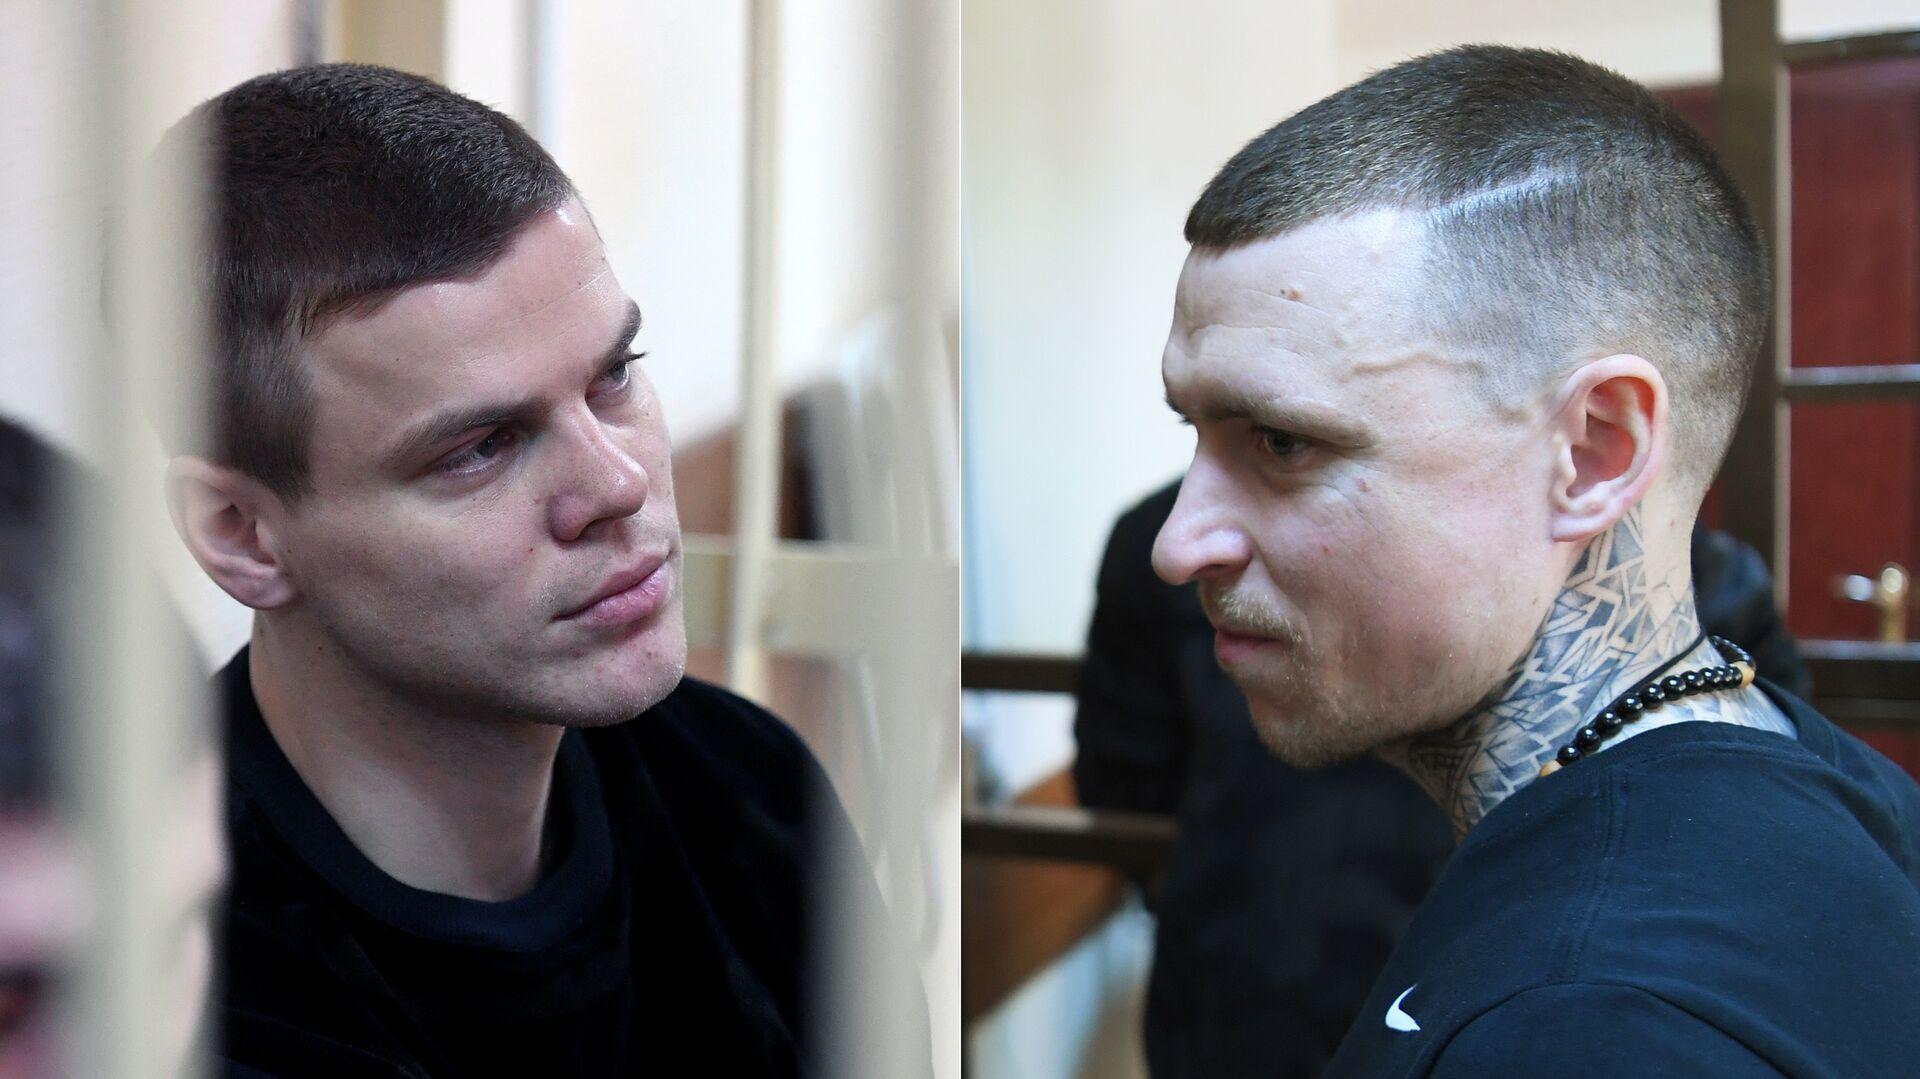 Футболисты Александр Кокорин и Павел Мамаев в суде - РИА Новости, 1920, 09.05.2019